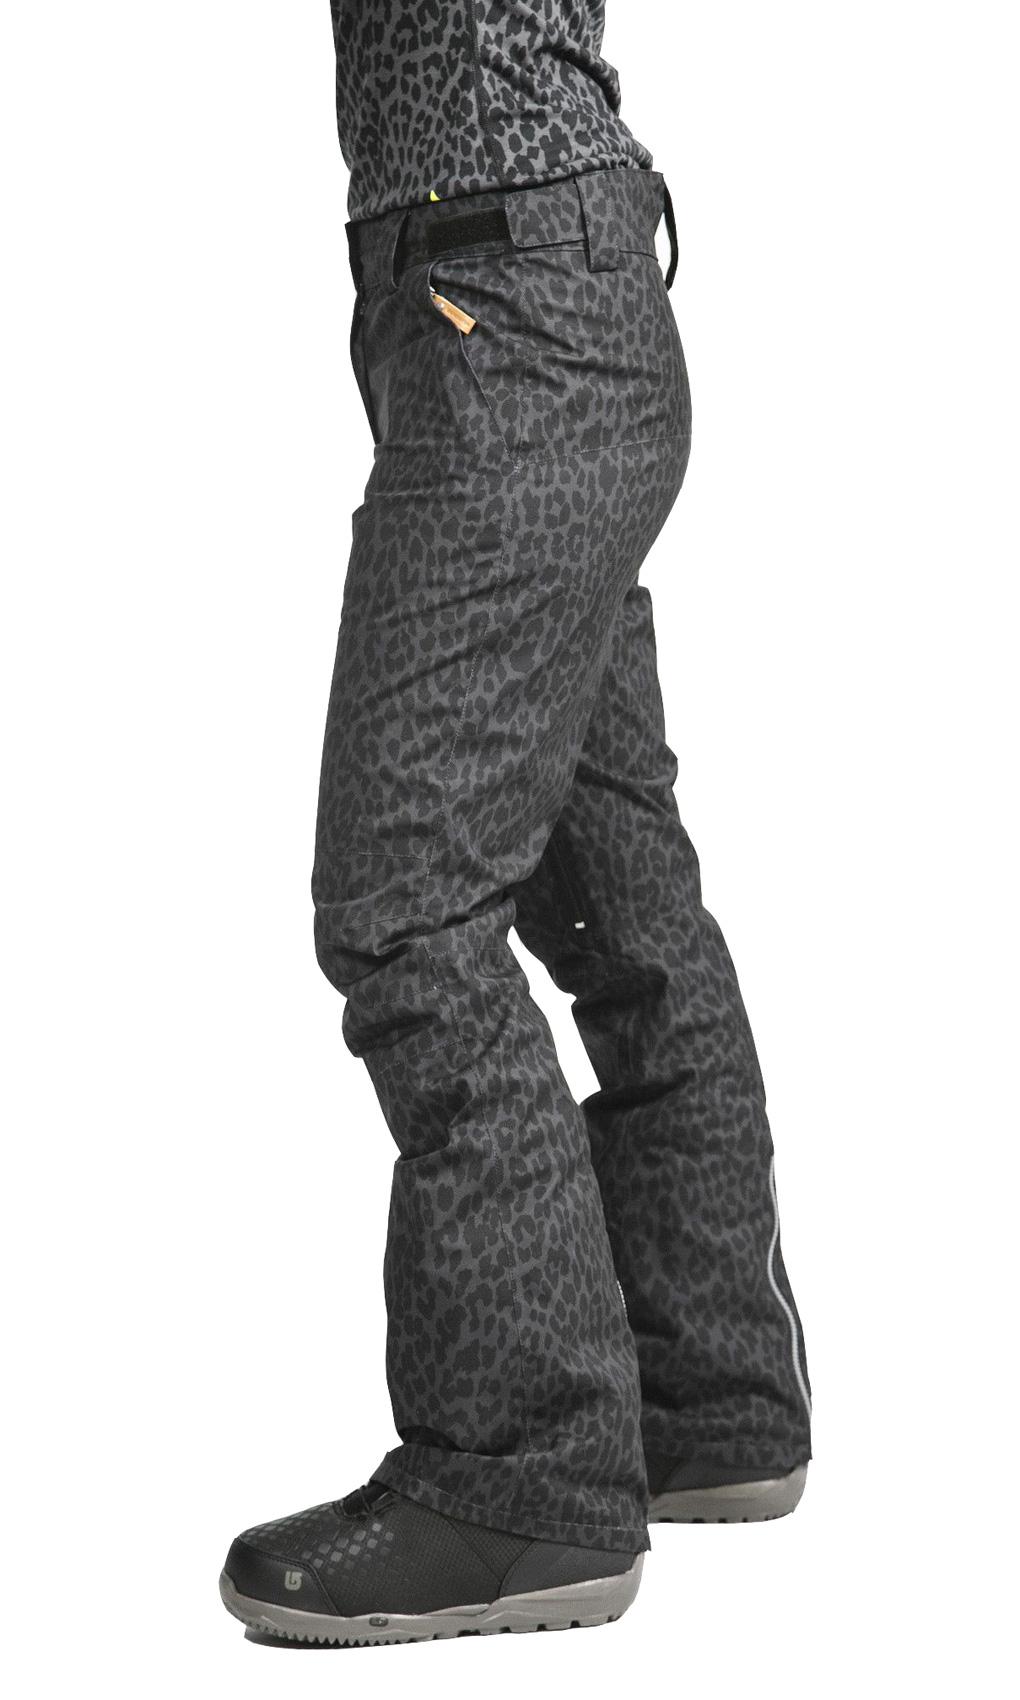 Wear Colour Womens Snowboard Pants - Slant - Ladies Ski Trousers ... 66e4d9eee